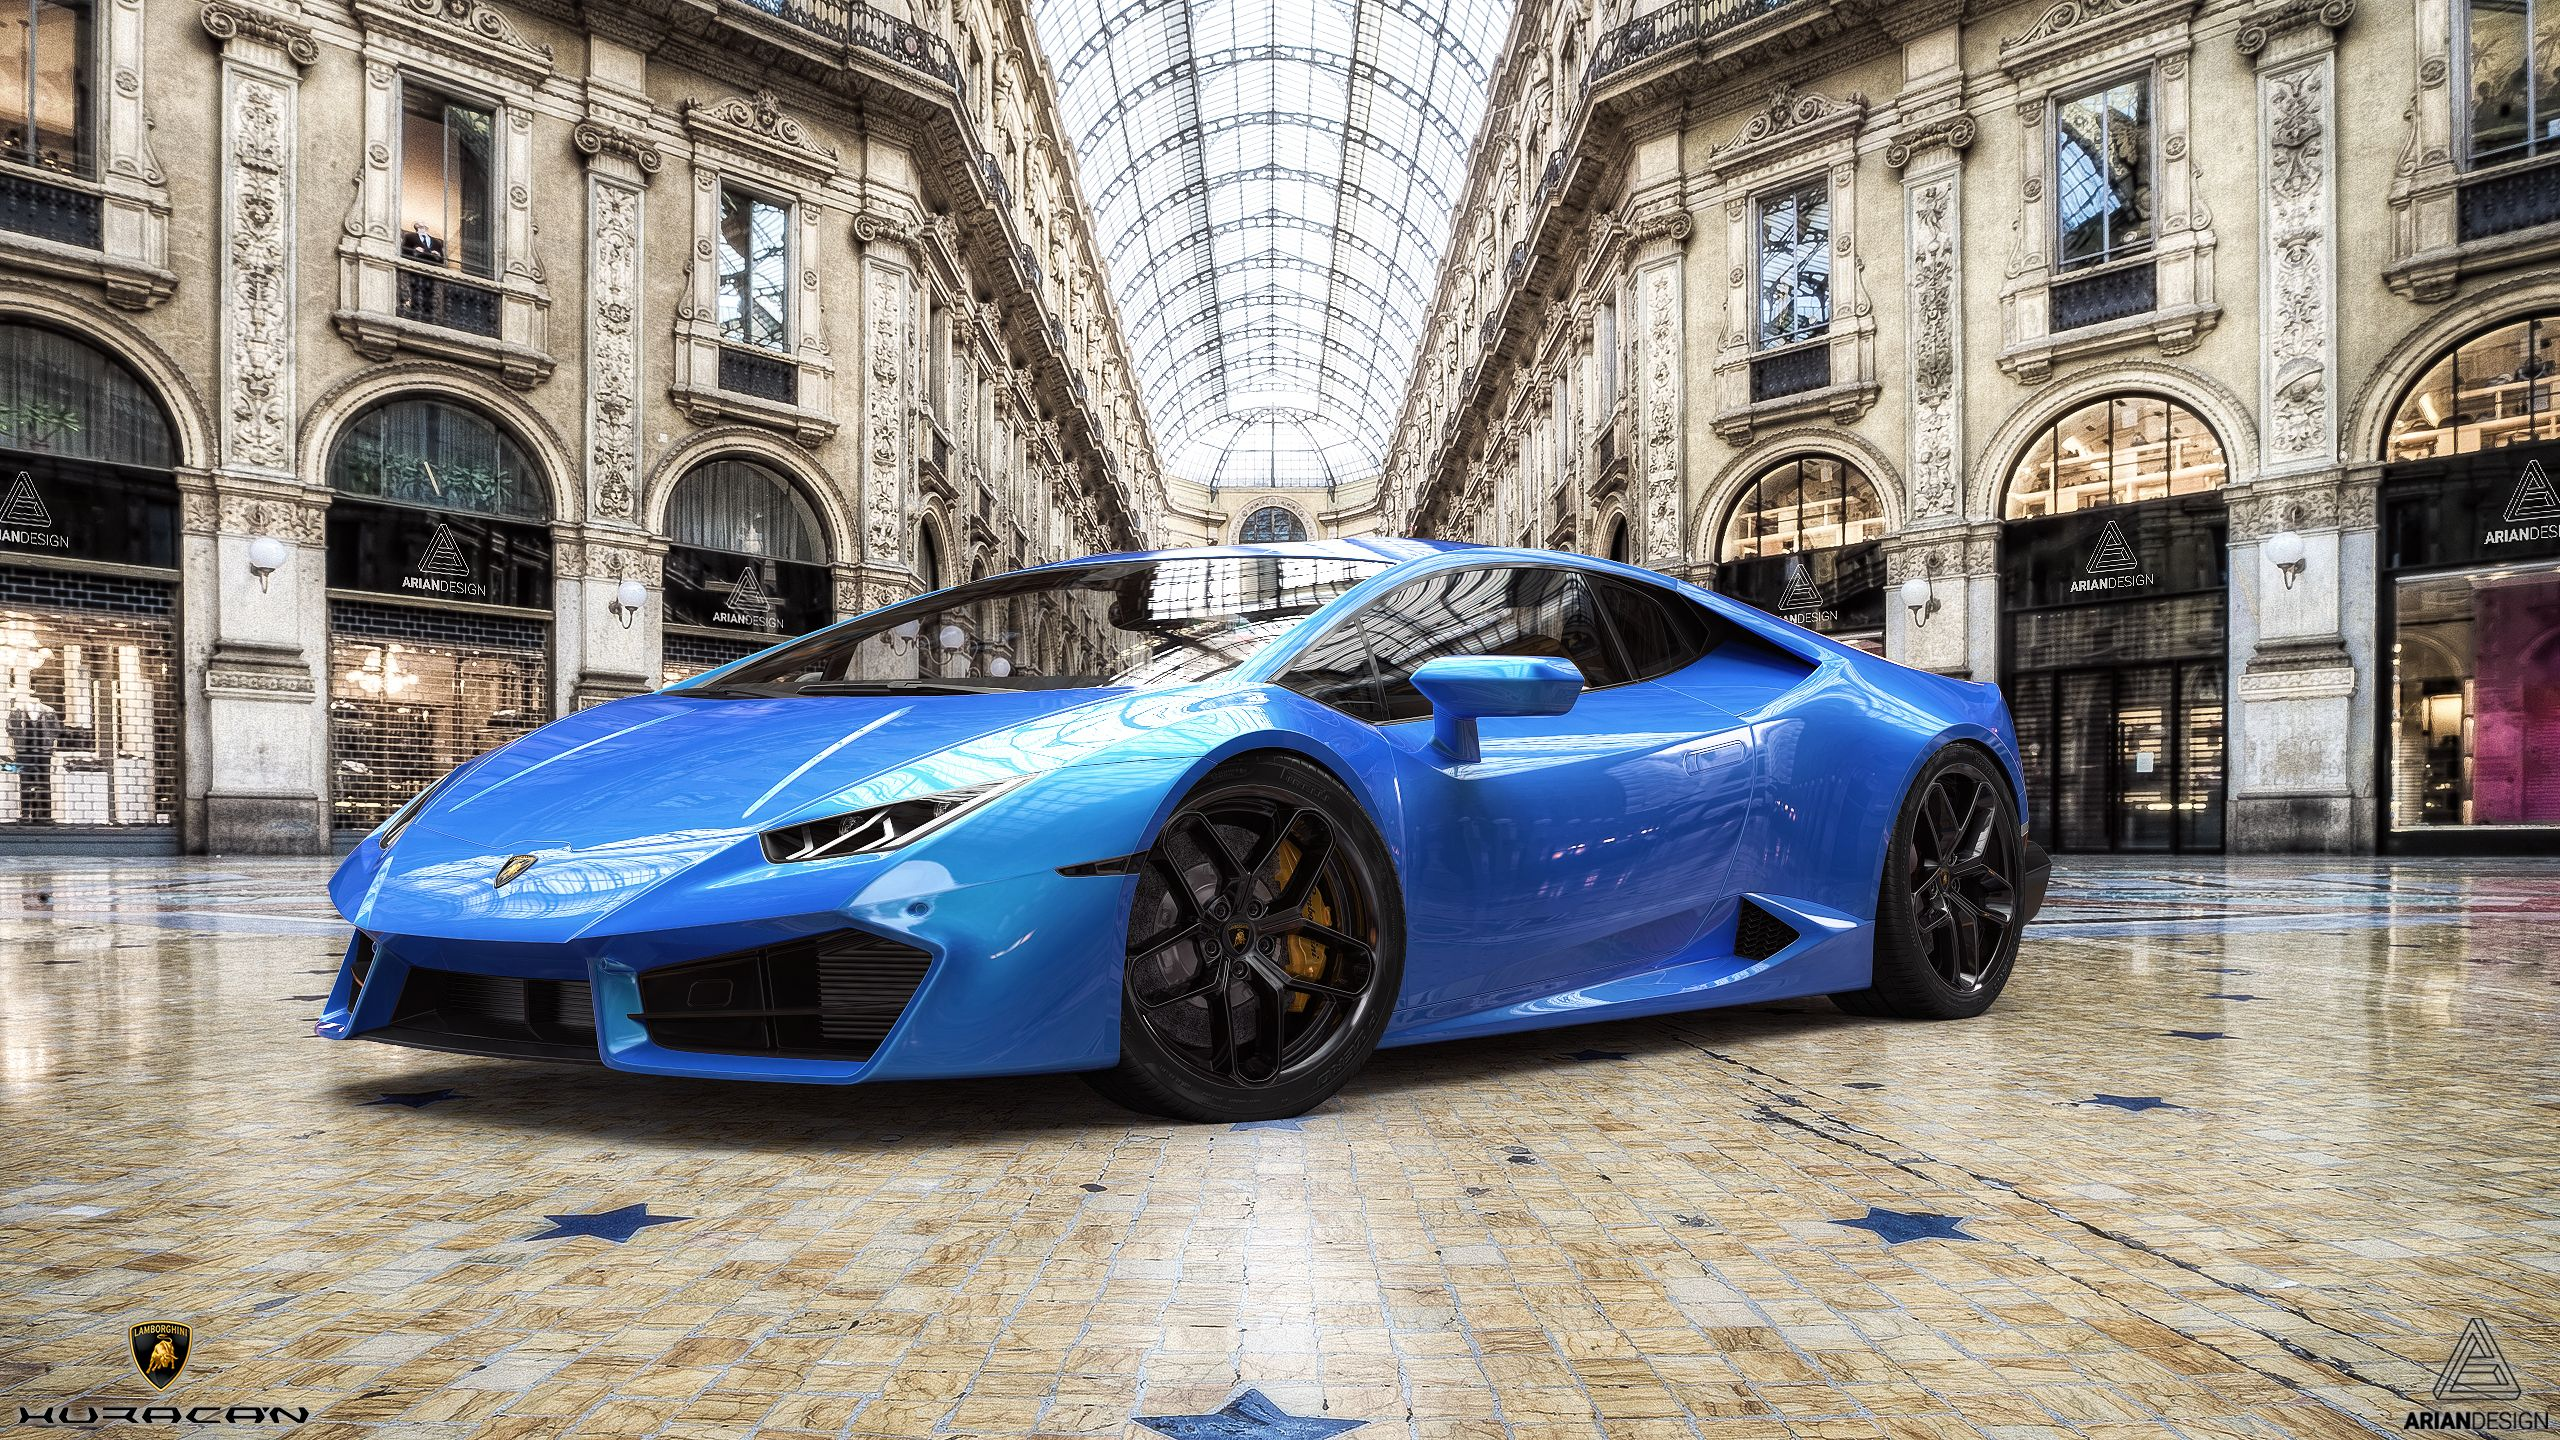 Rentluxurycar Milan Luxury Car Hire Luxury Car Rental Car